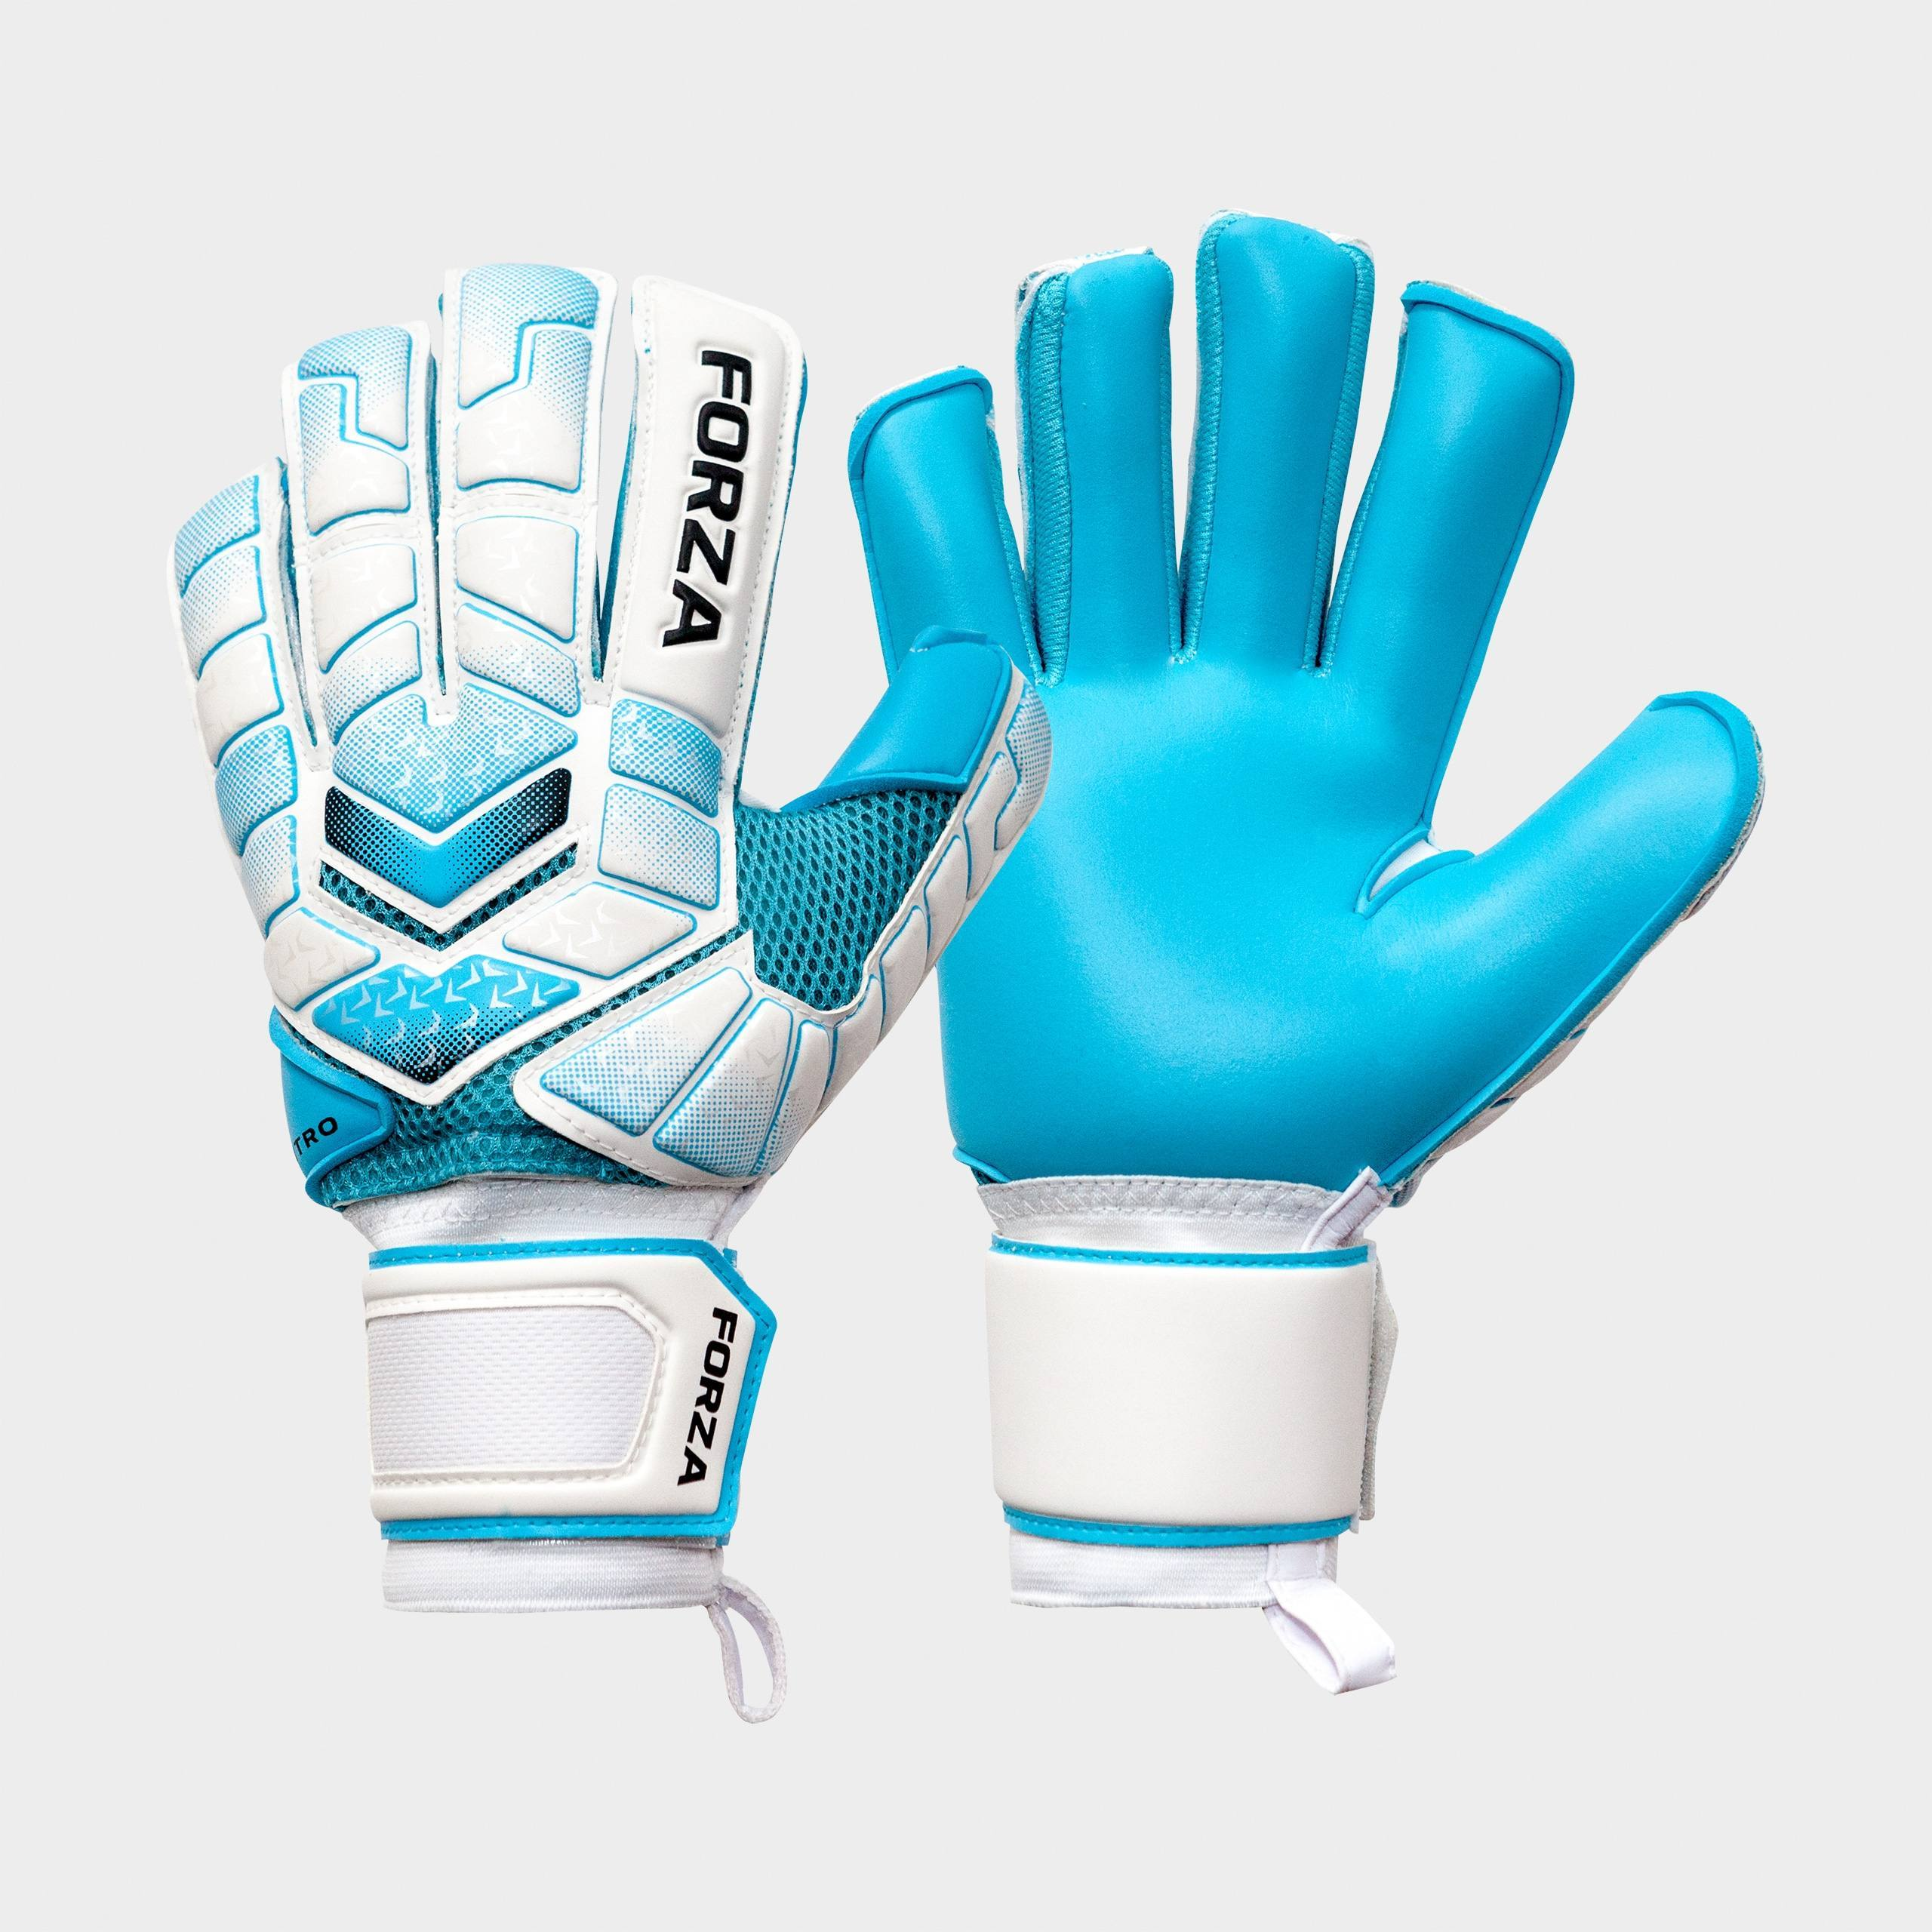 Rebel Sport Keeper Gloves: FORZA Centro Goalkeeper Glove